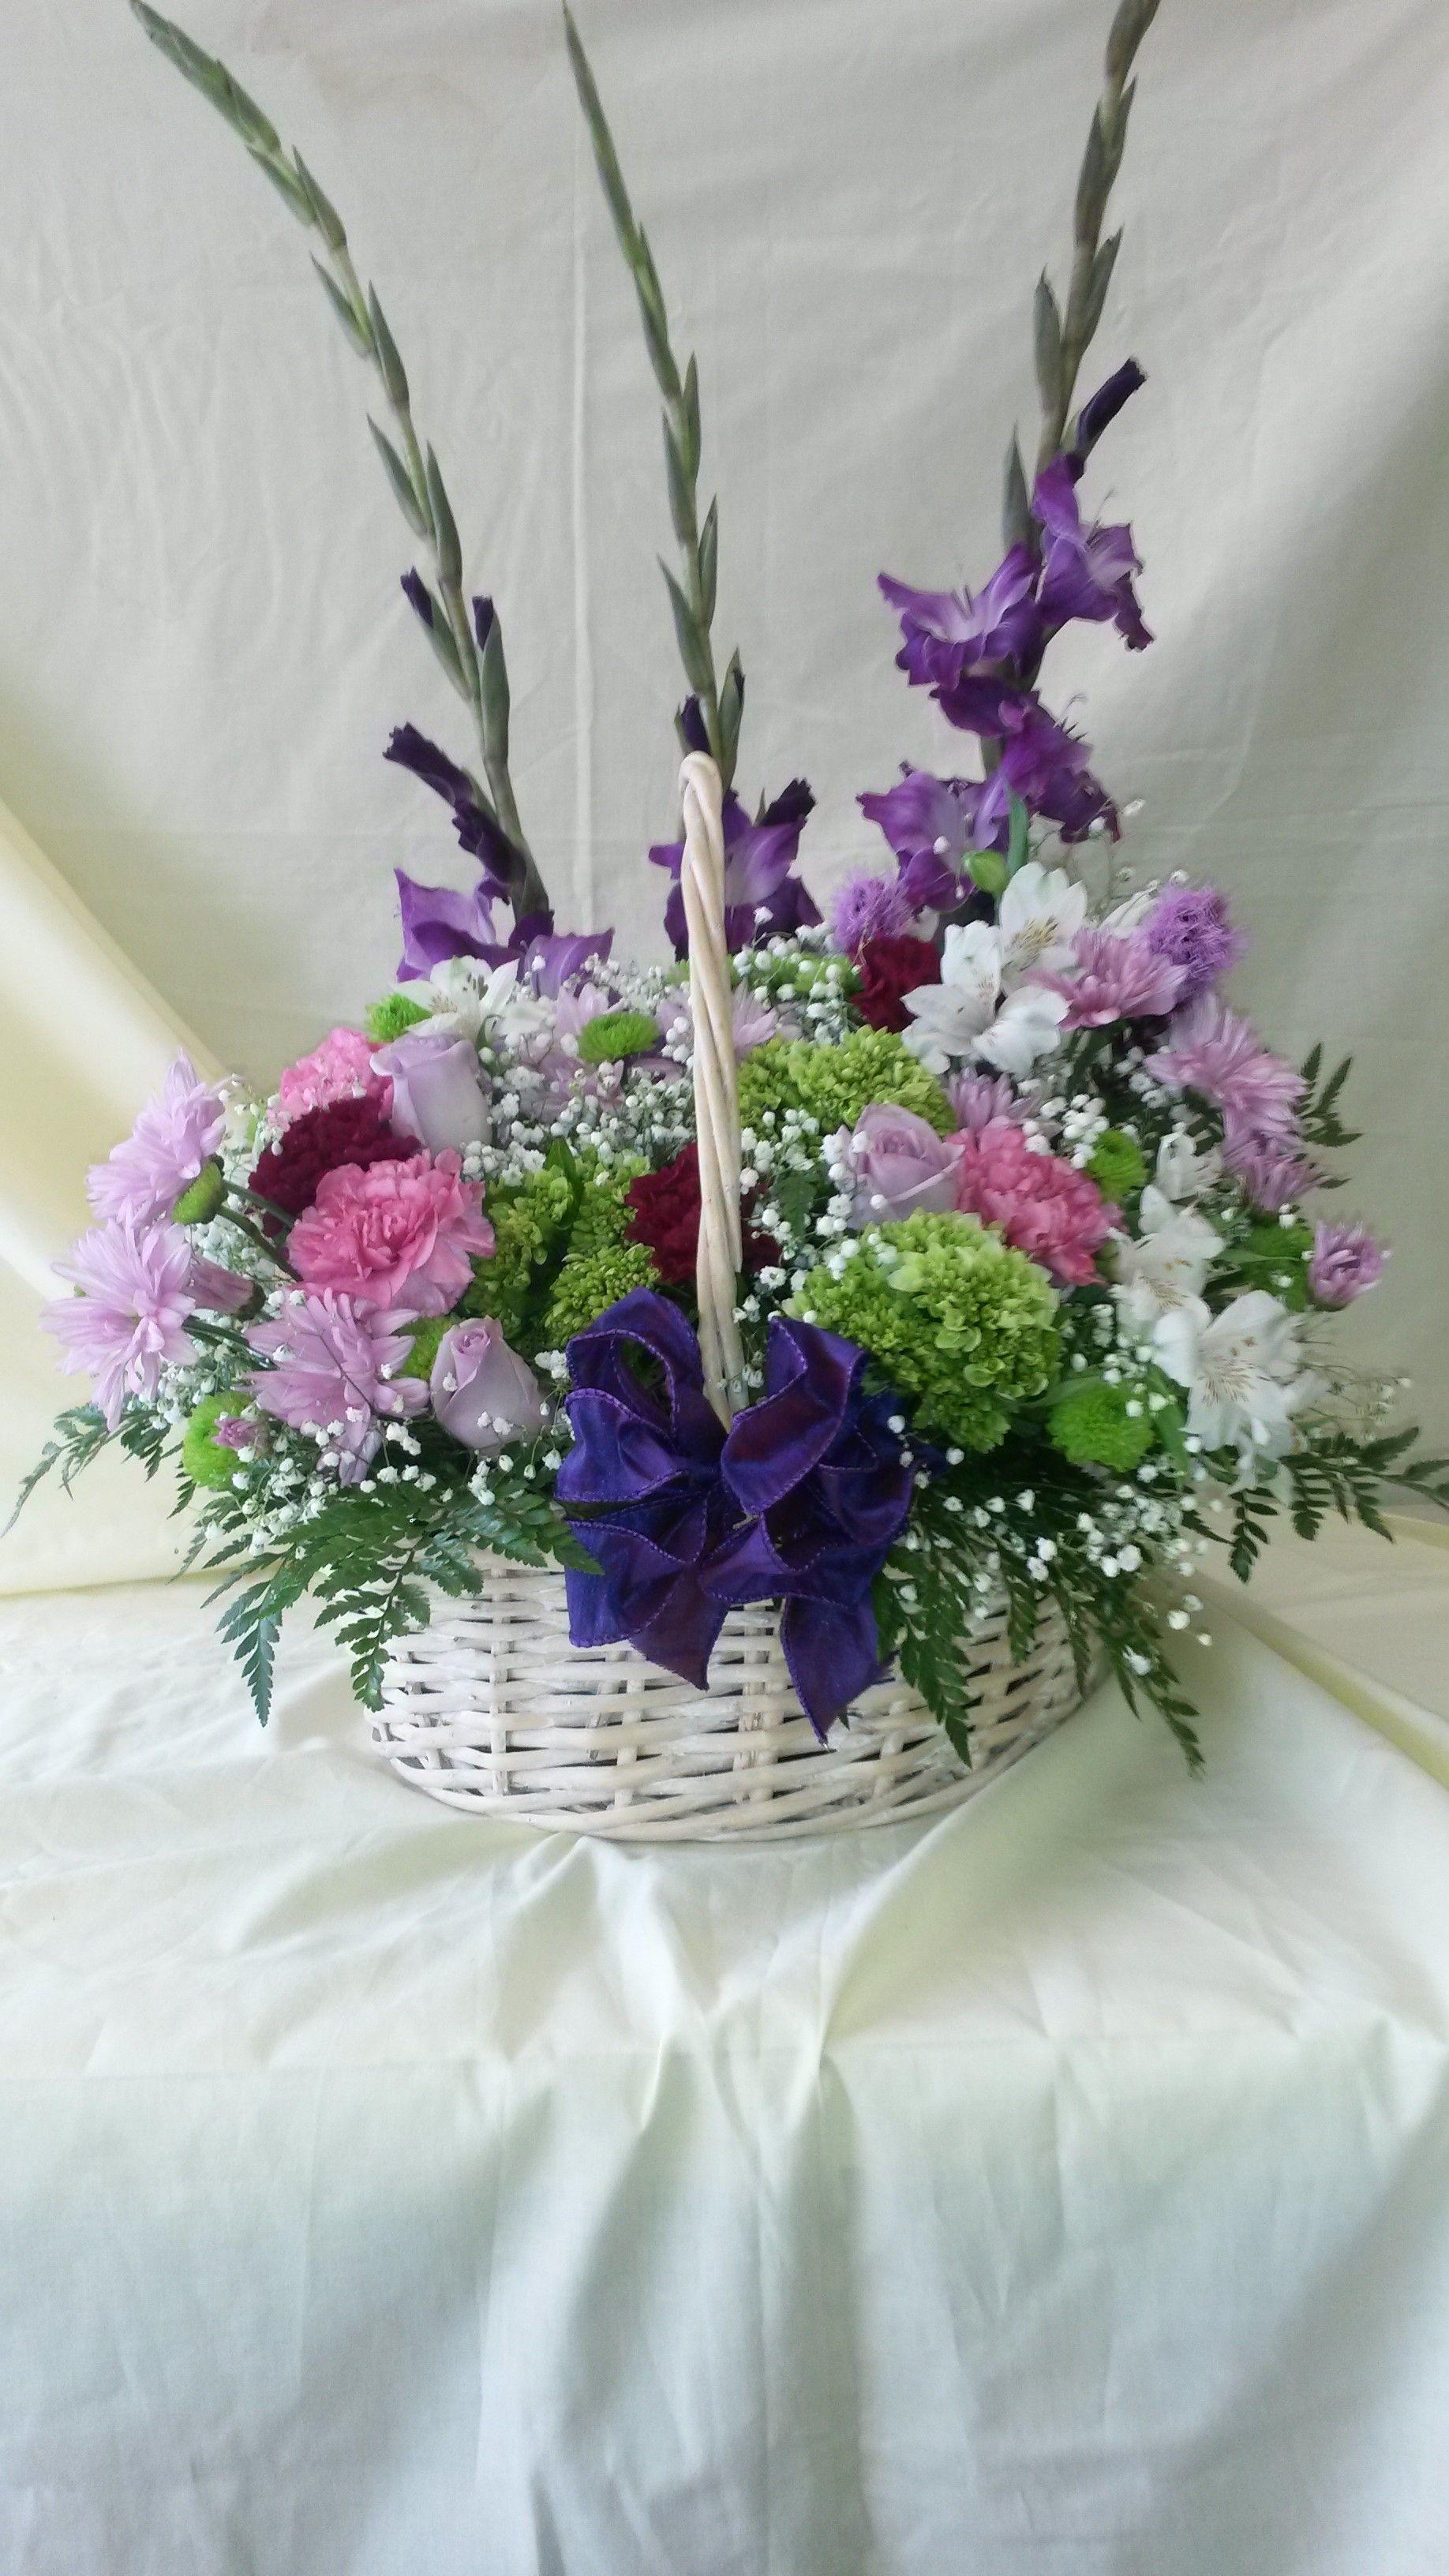 This Funeral Arrangement Features Purple Gladiolas, White Alstroemeria, Purple Mums,